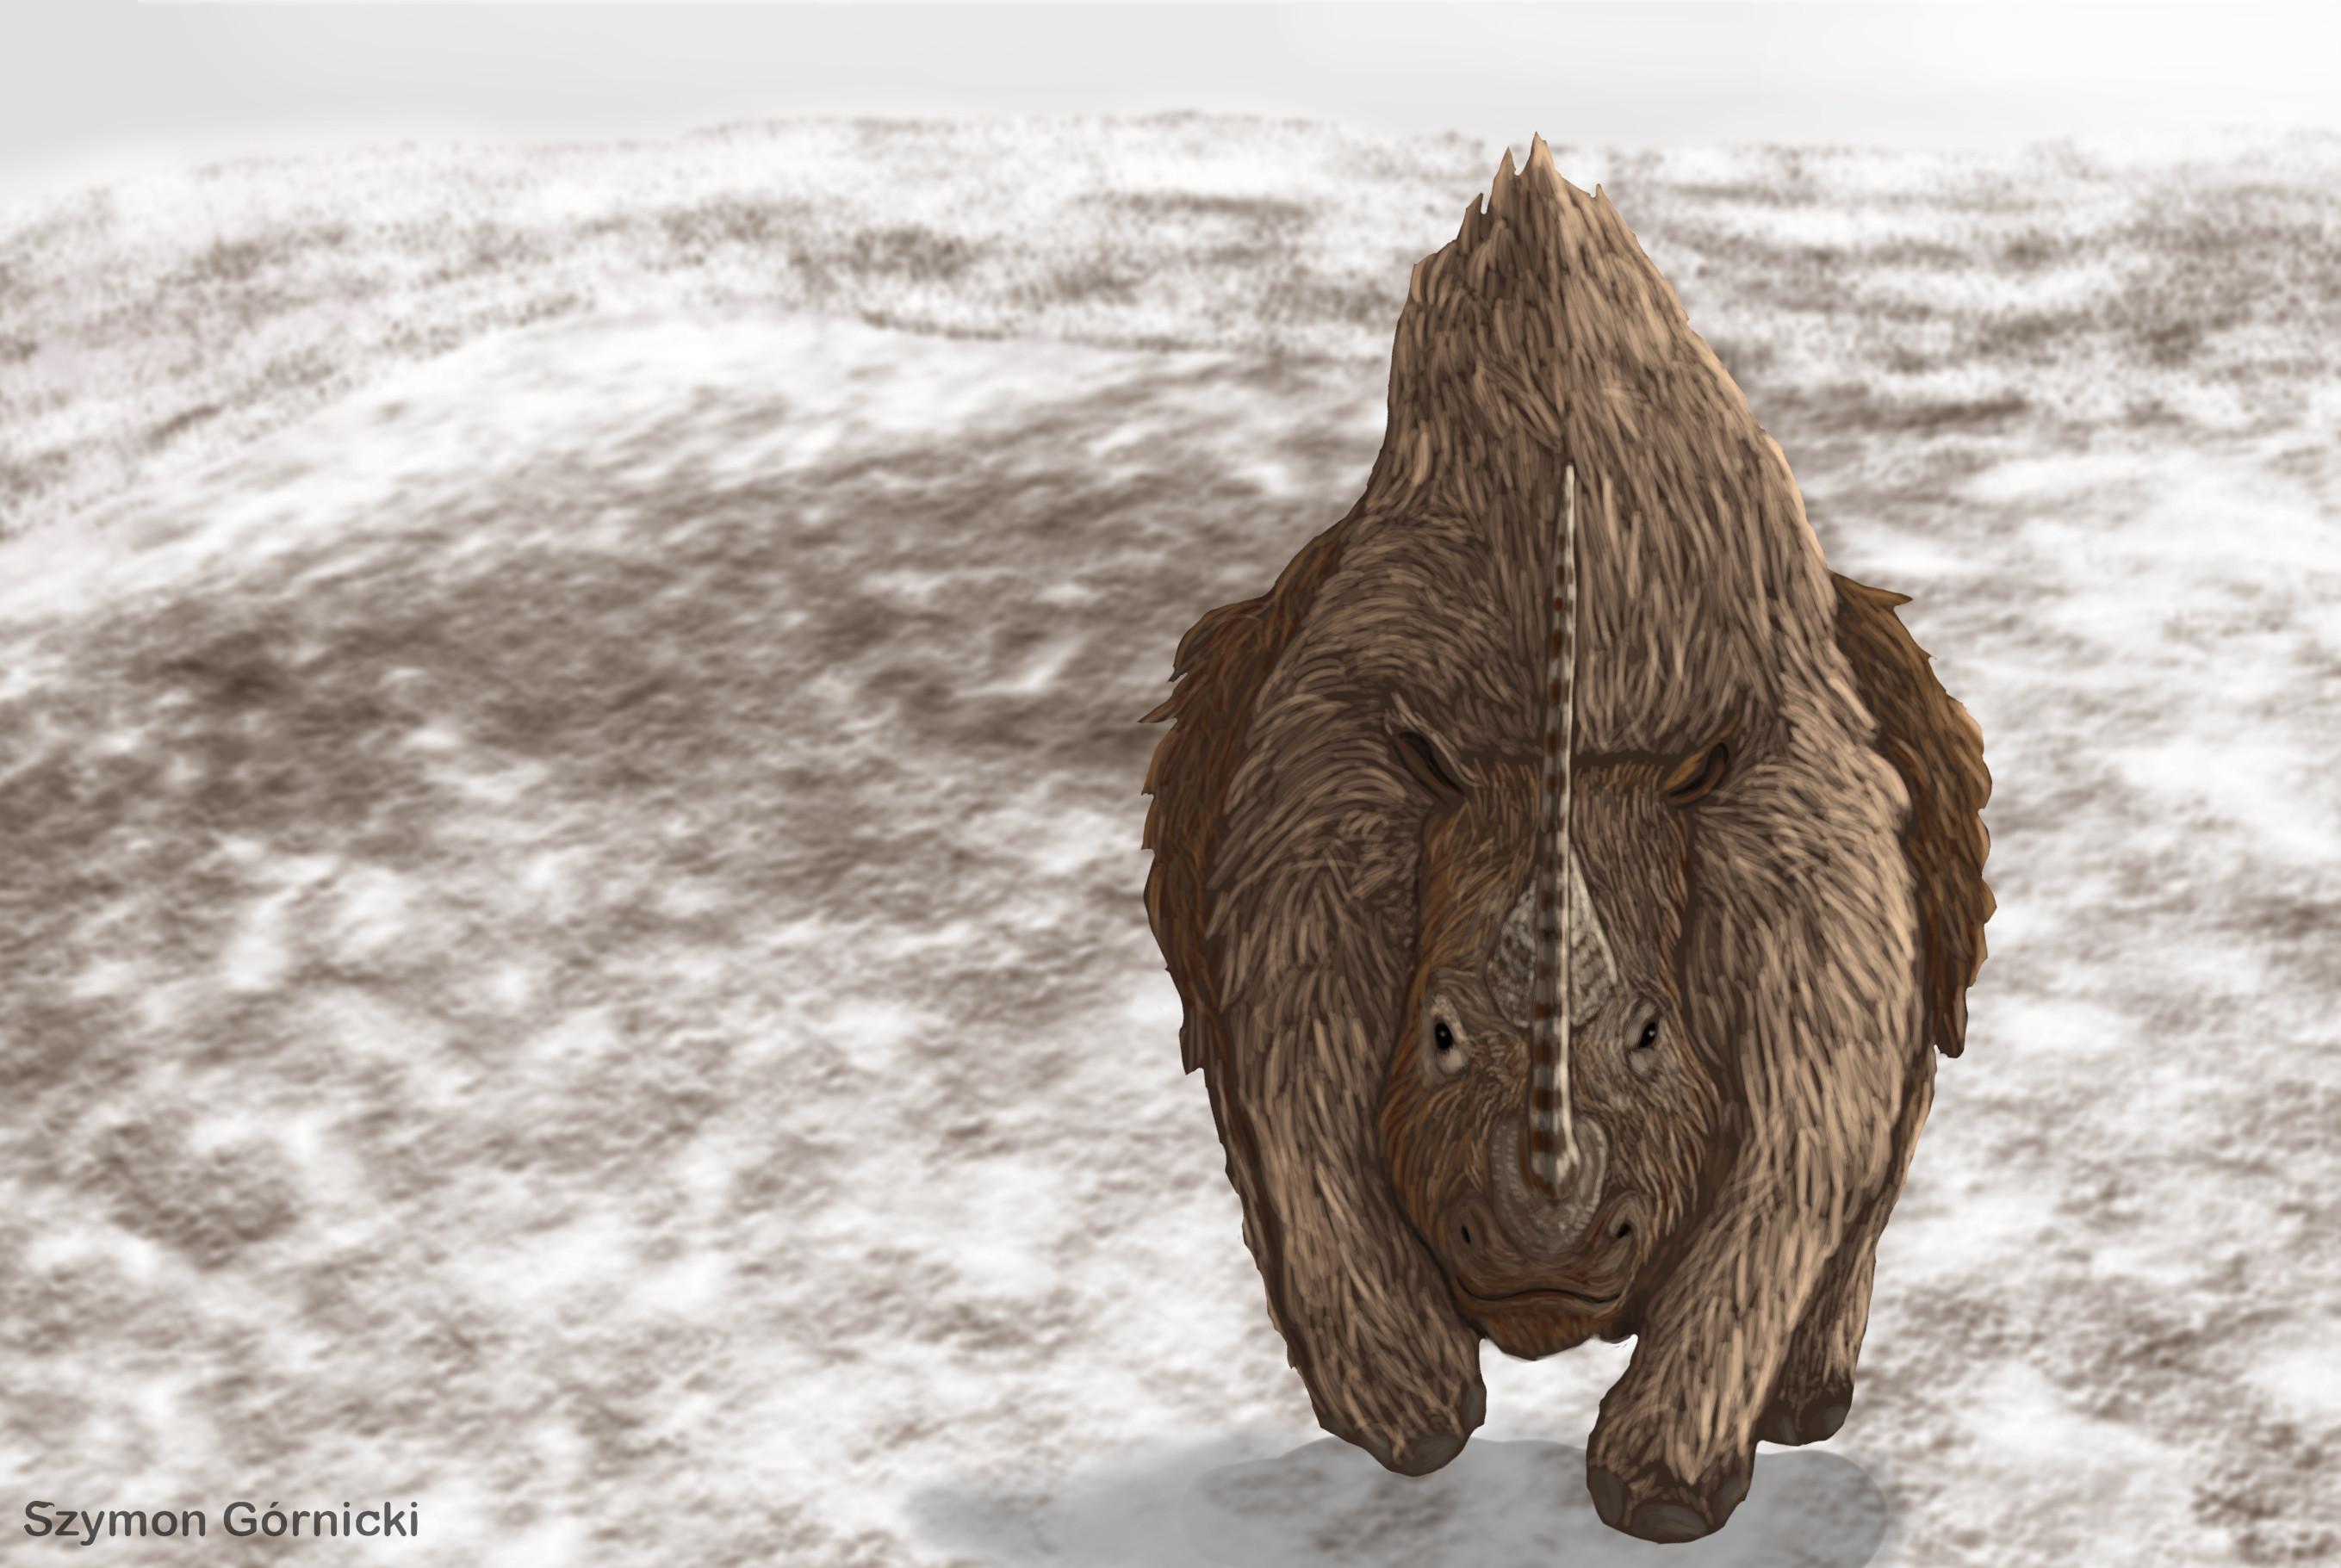 Charging woolly rhinoceros.